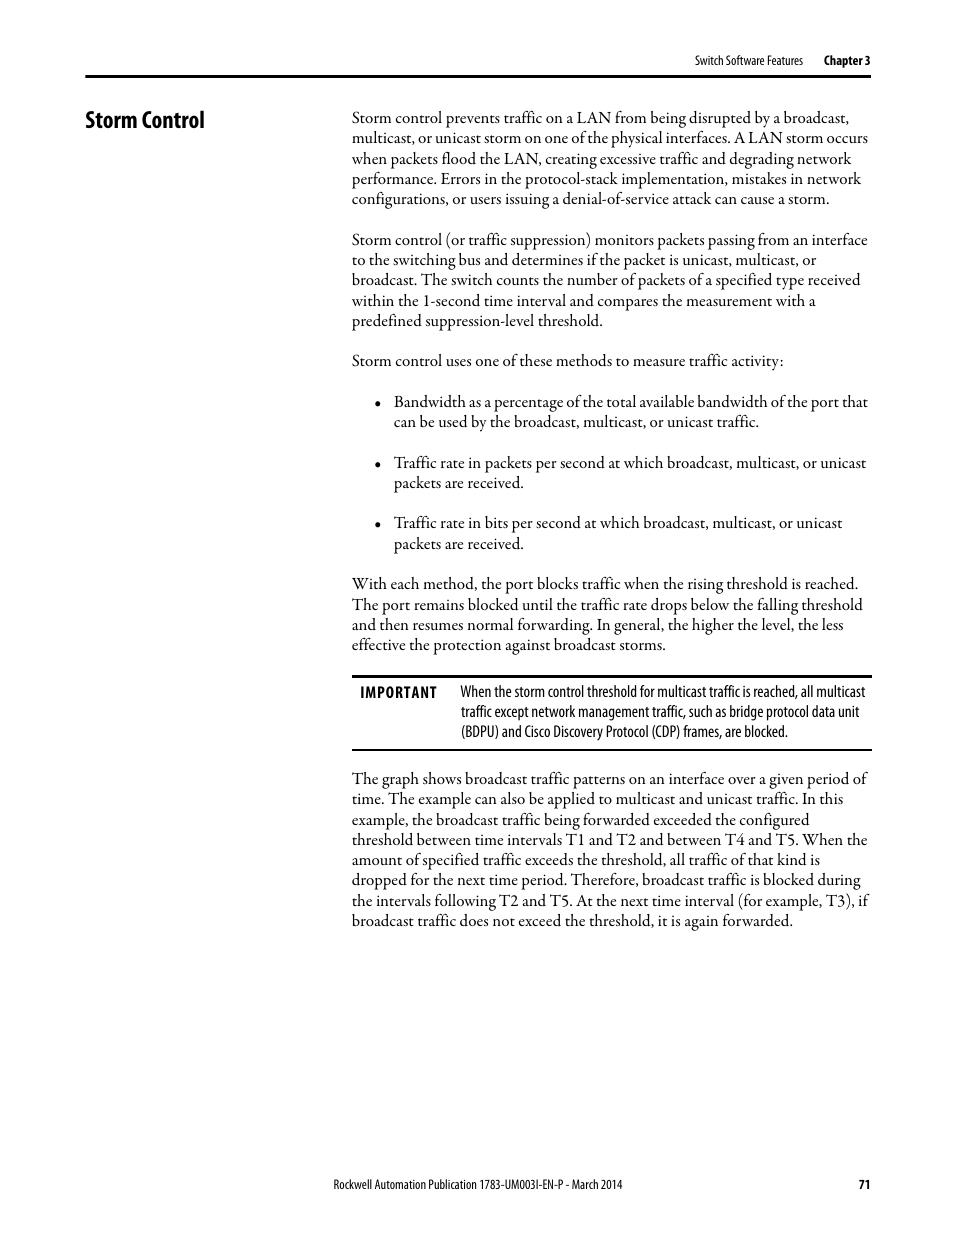 Storm control | Rockwell Automation 1783-Mxxx Stratix 8000